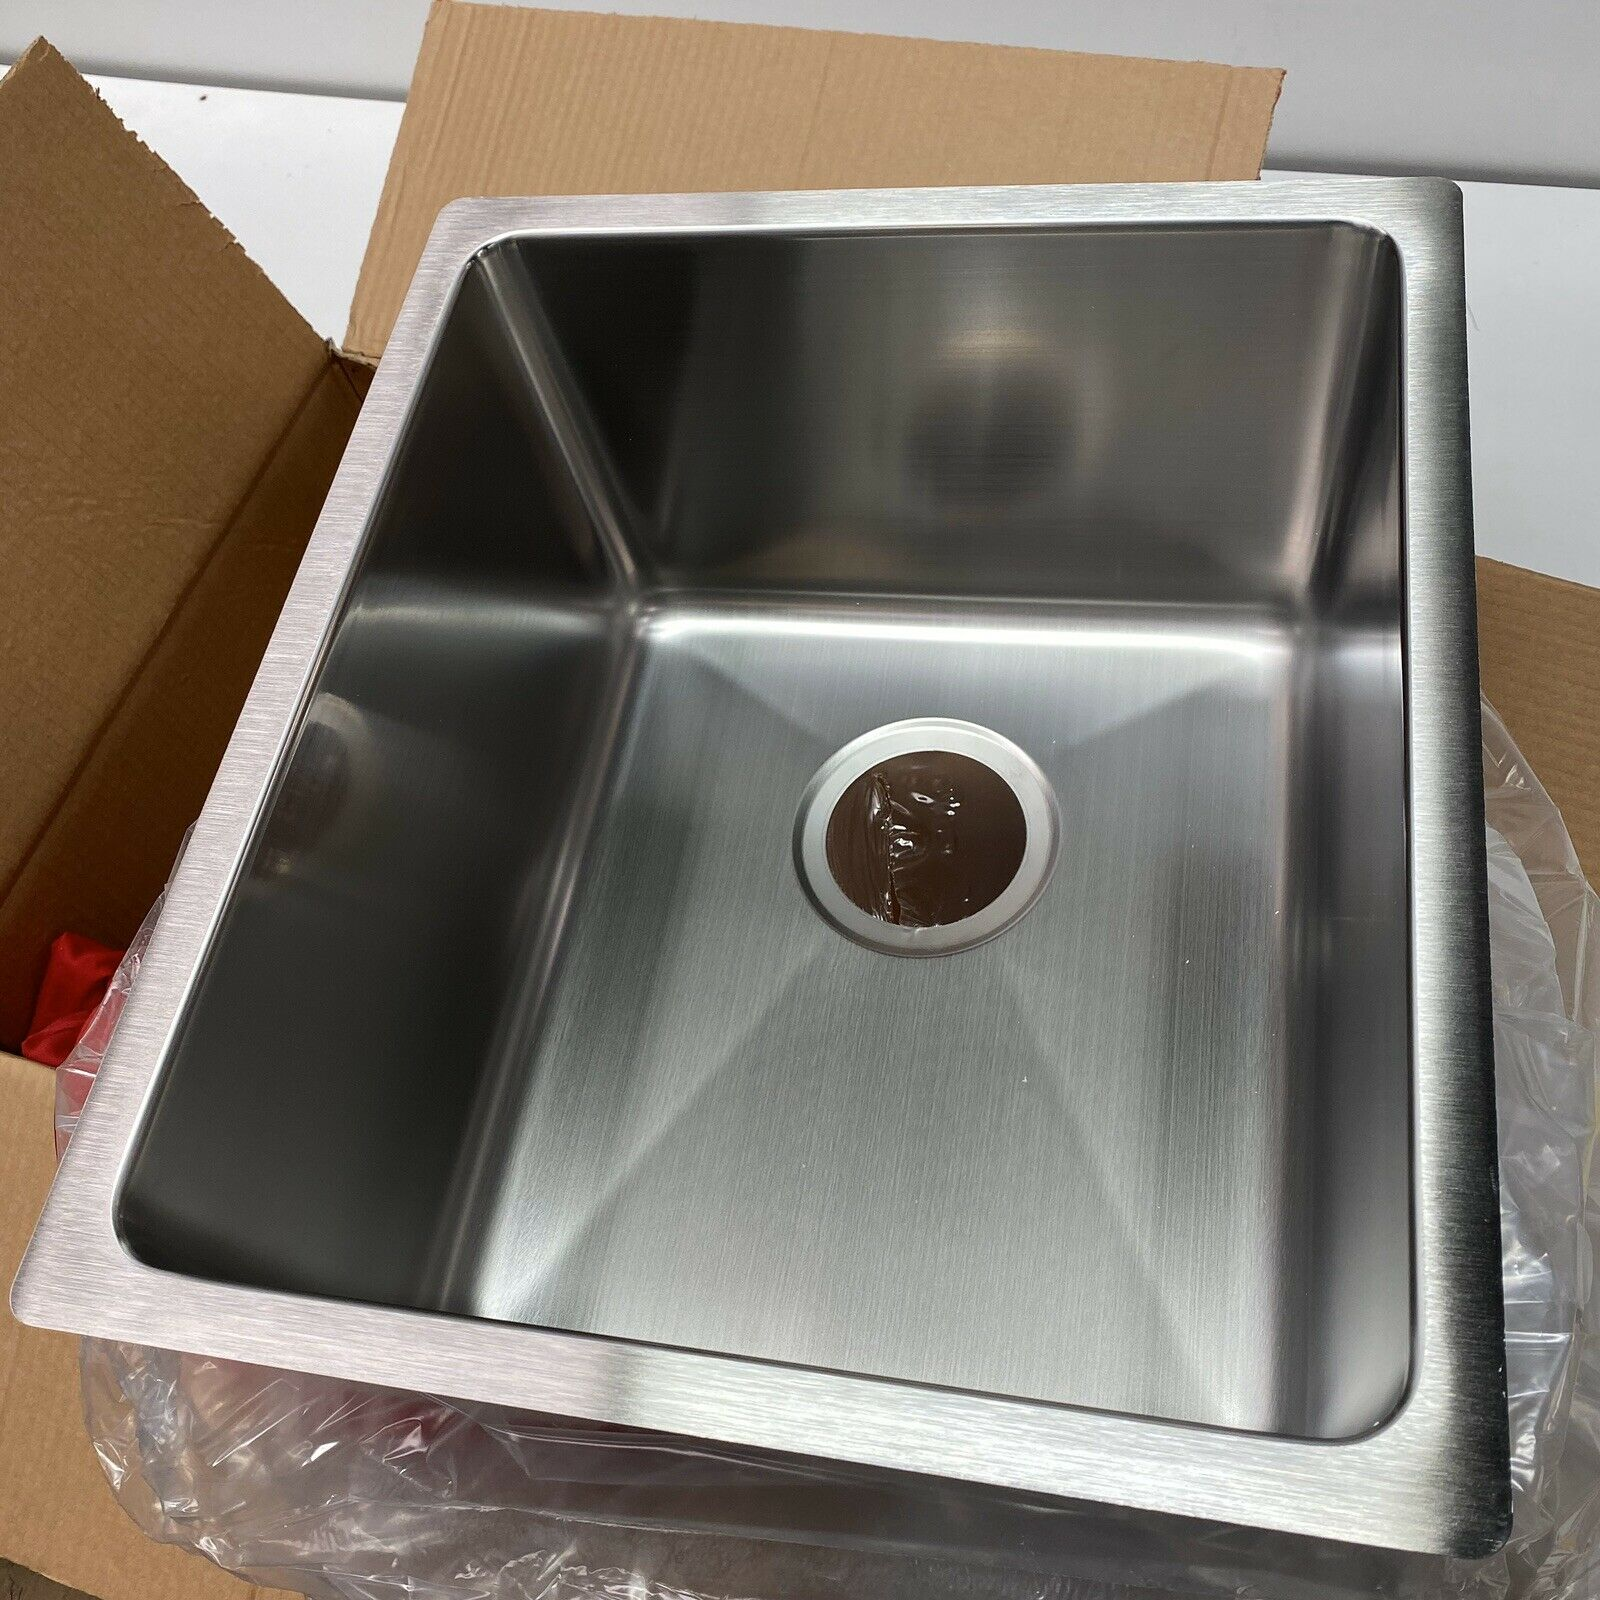 "Ukinox R 340.9 Undermount 15"" Single Bowl Stainless Steel Sink 18 Gauge  *NEW*"